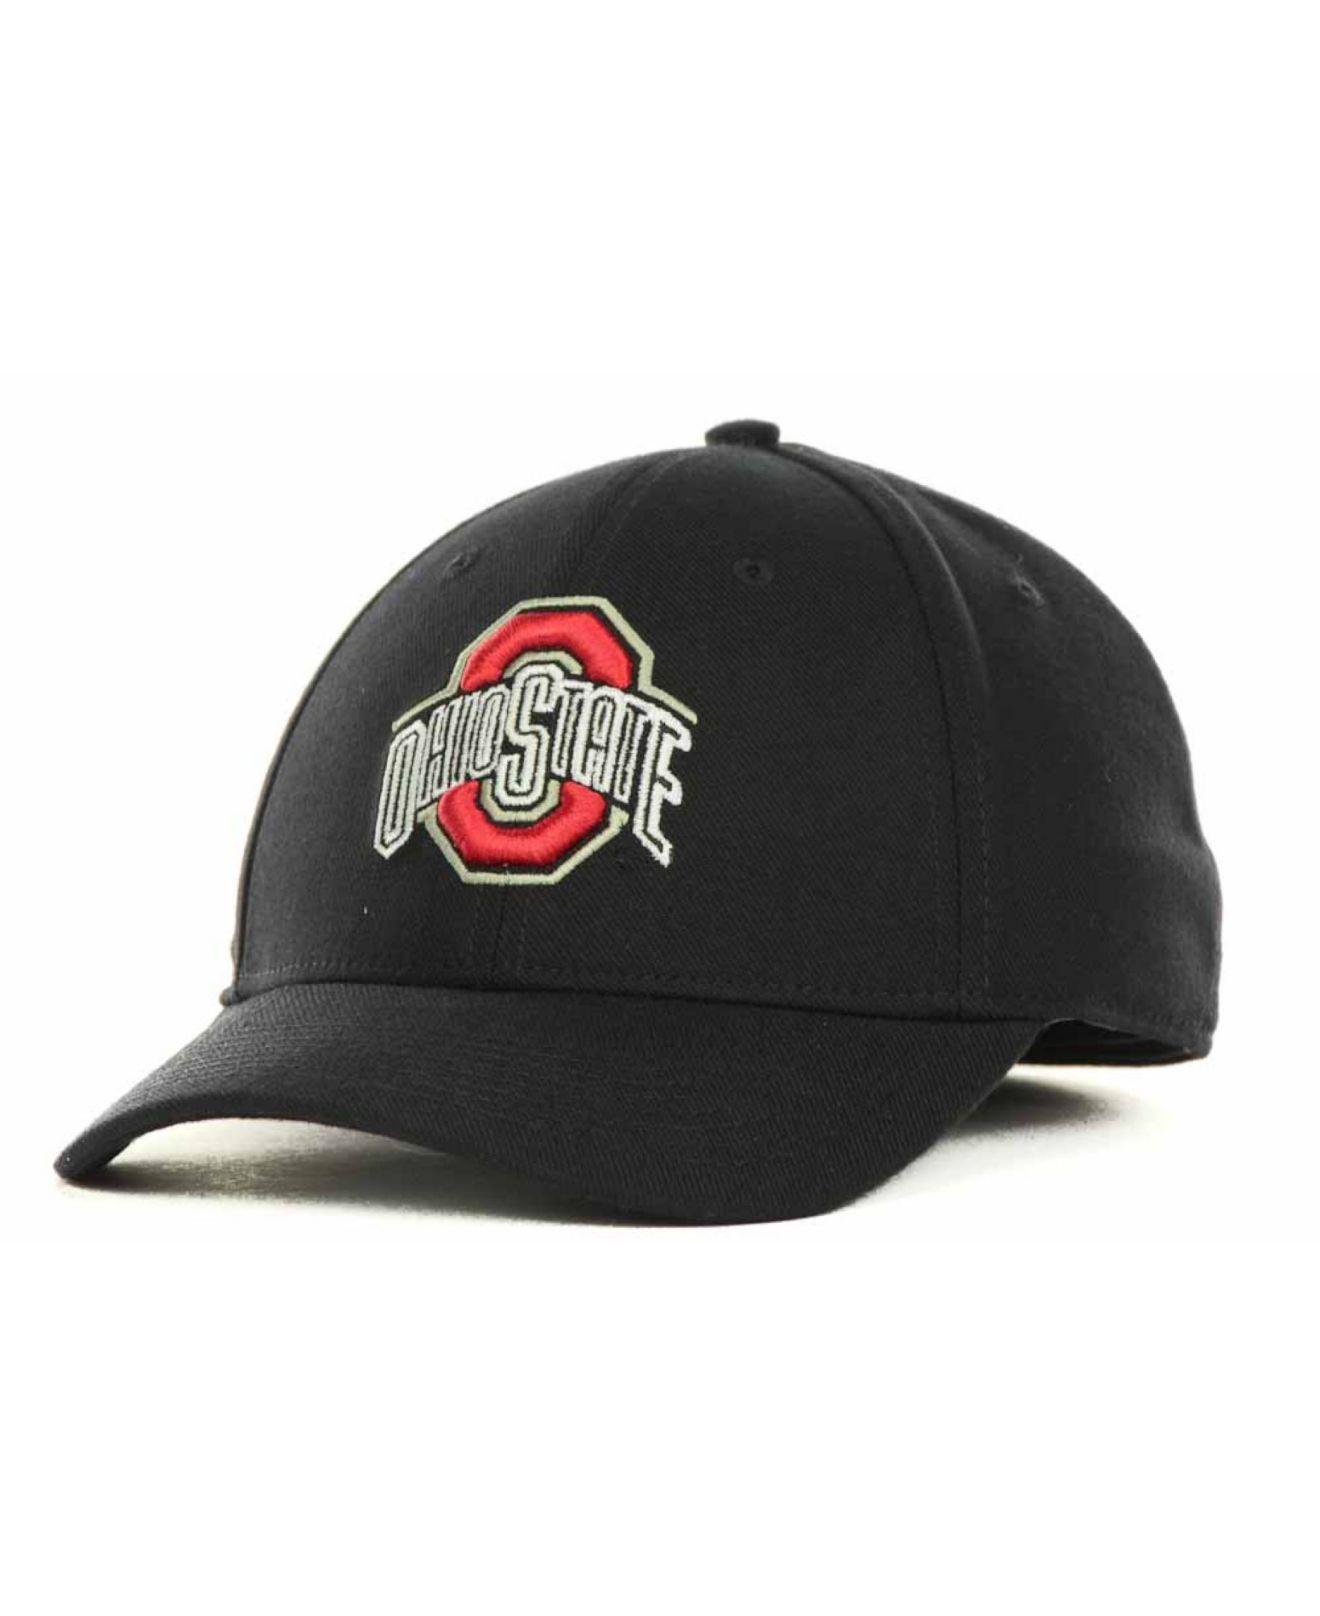 10087c7471958f Nike Ohio State Buckeyes Drifit Swoosh Flex Cap in Black for Men - Lyst